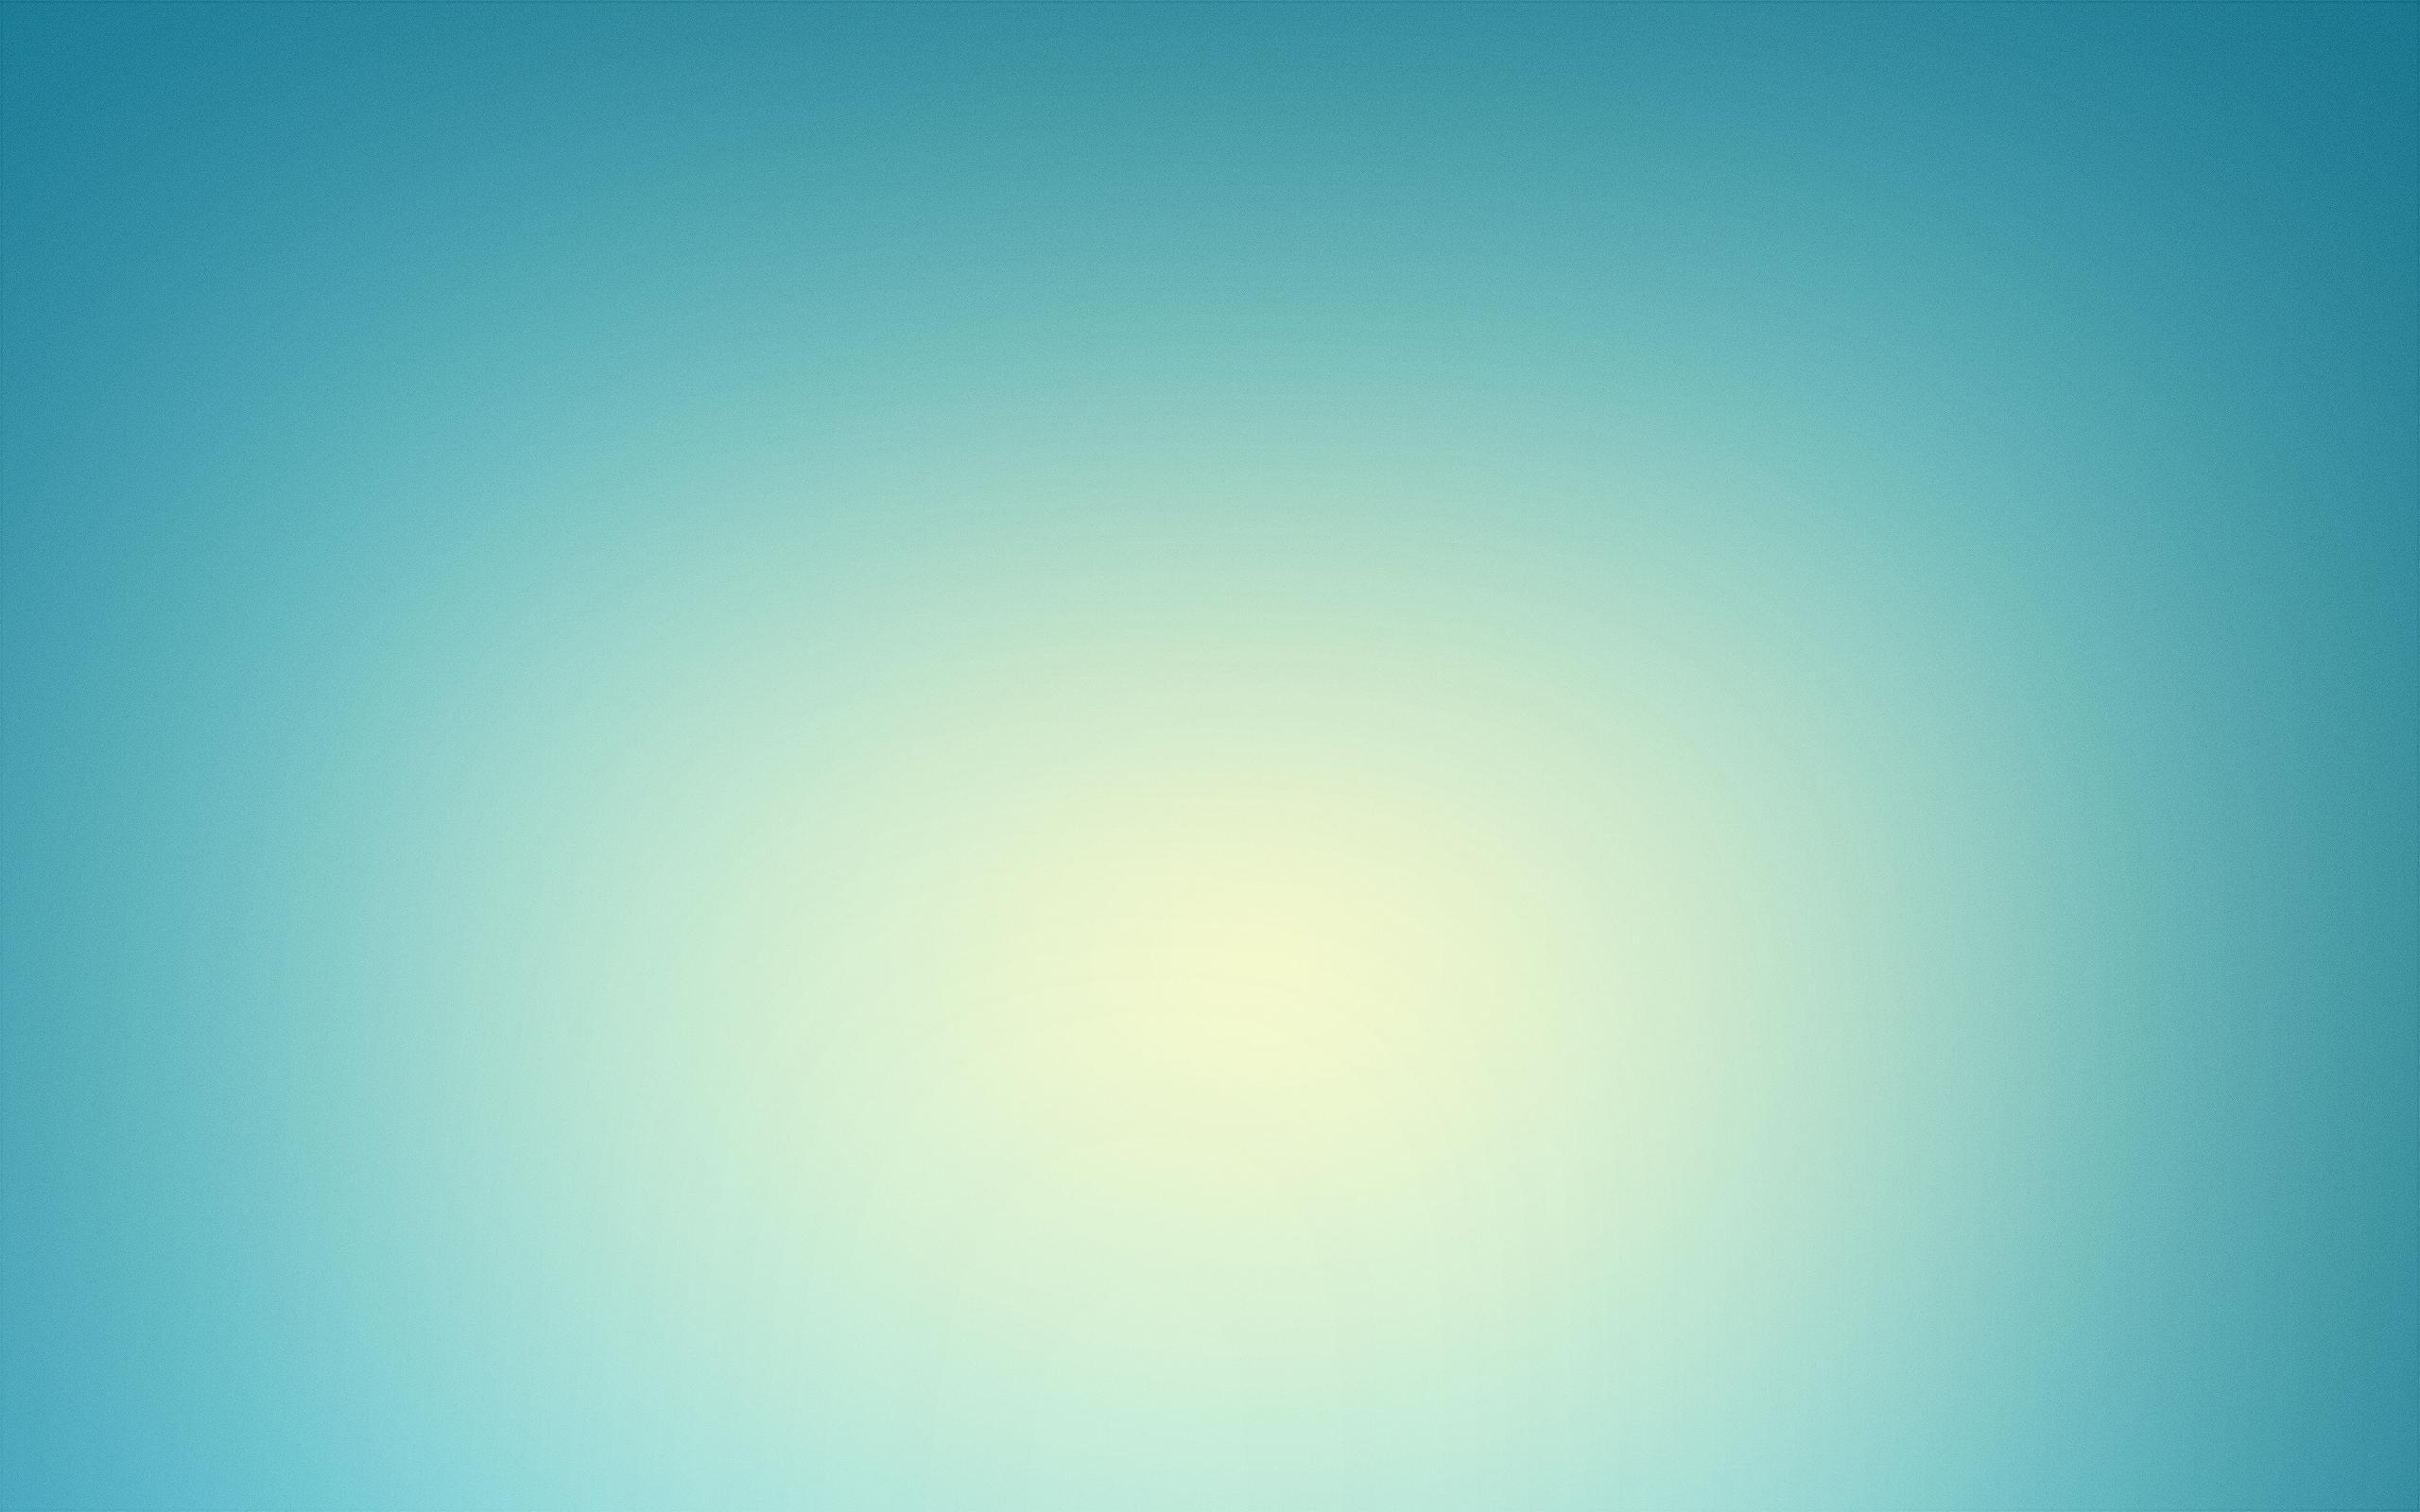 Light Blue Abstract Full HD Wallpaper 725 Wallpaper 2560x1600